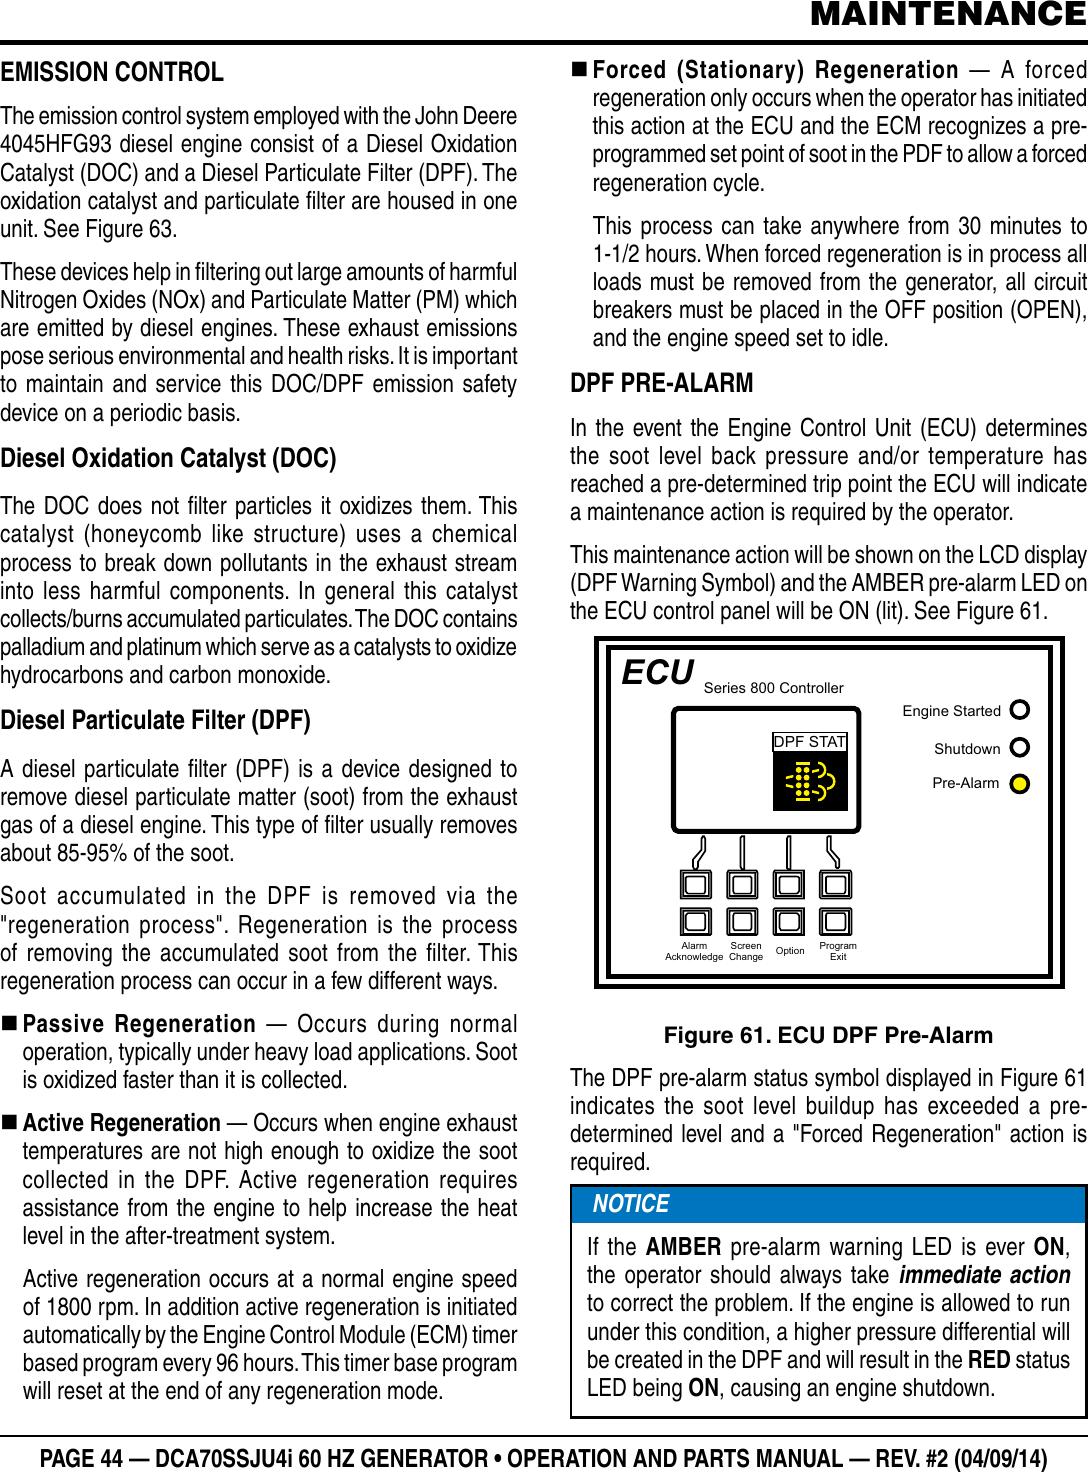 John Deere Products And Services Portable Generator Dca70Ssju4I